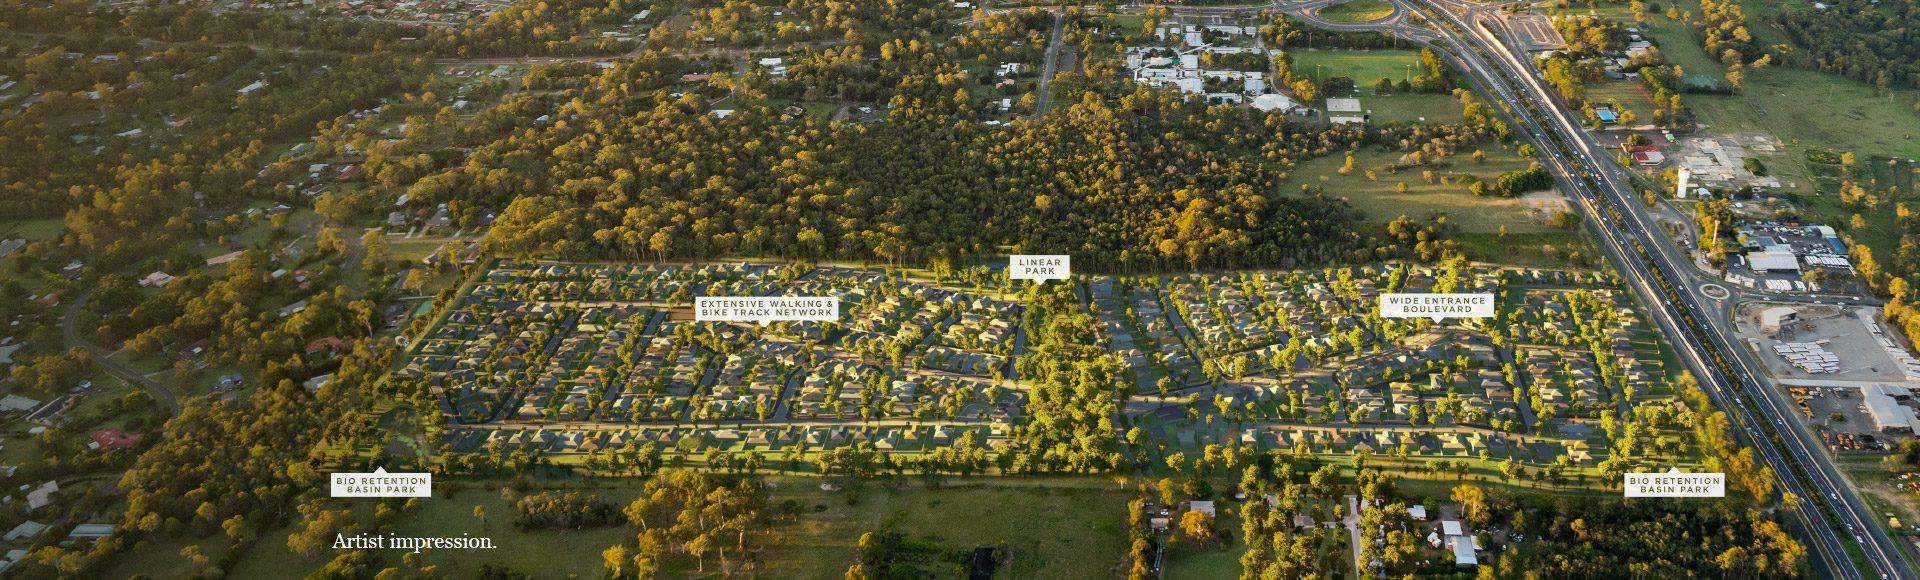 harvest-rise-land-for-sale-greenbank-aerial-masterplan